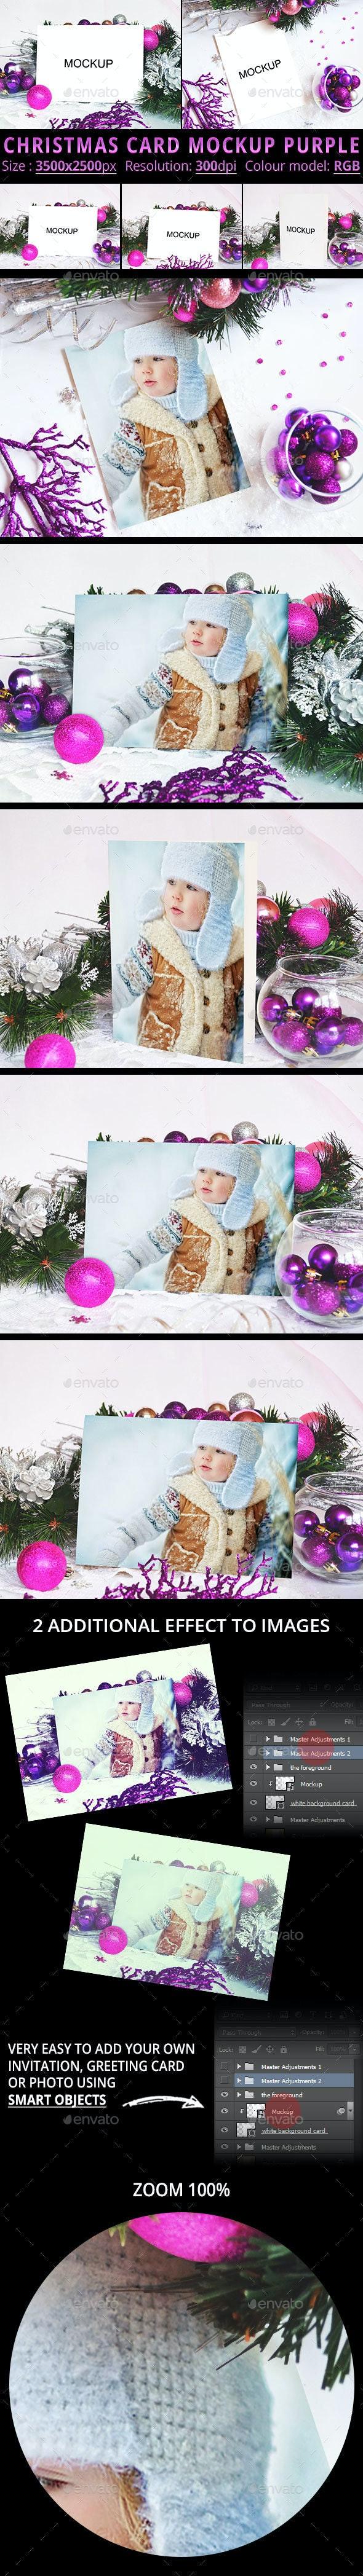 Christmas Card Mockup Purple - Print Product Mock-Ups